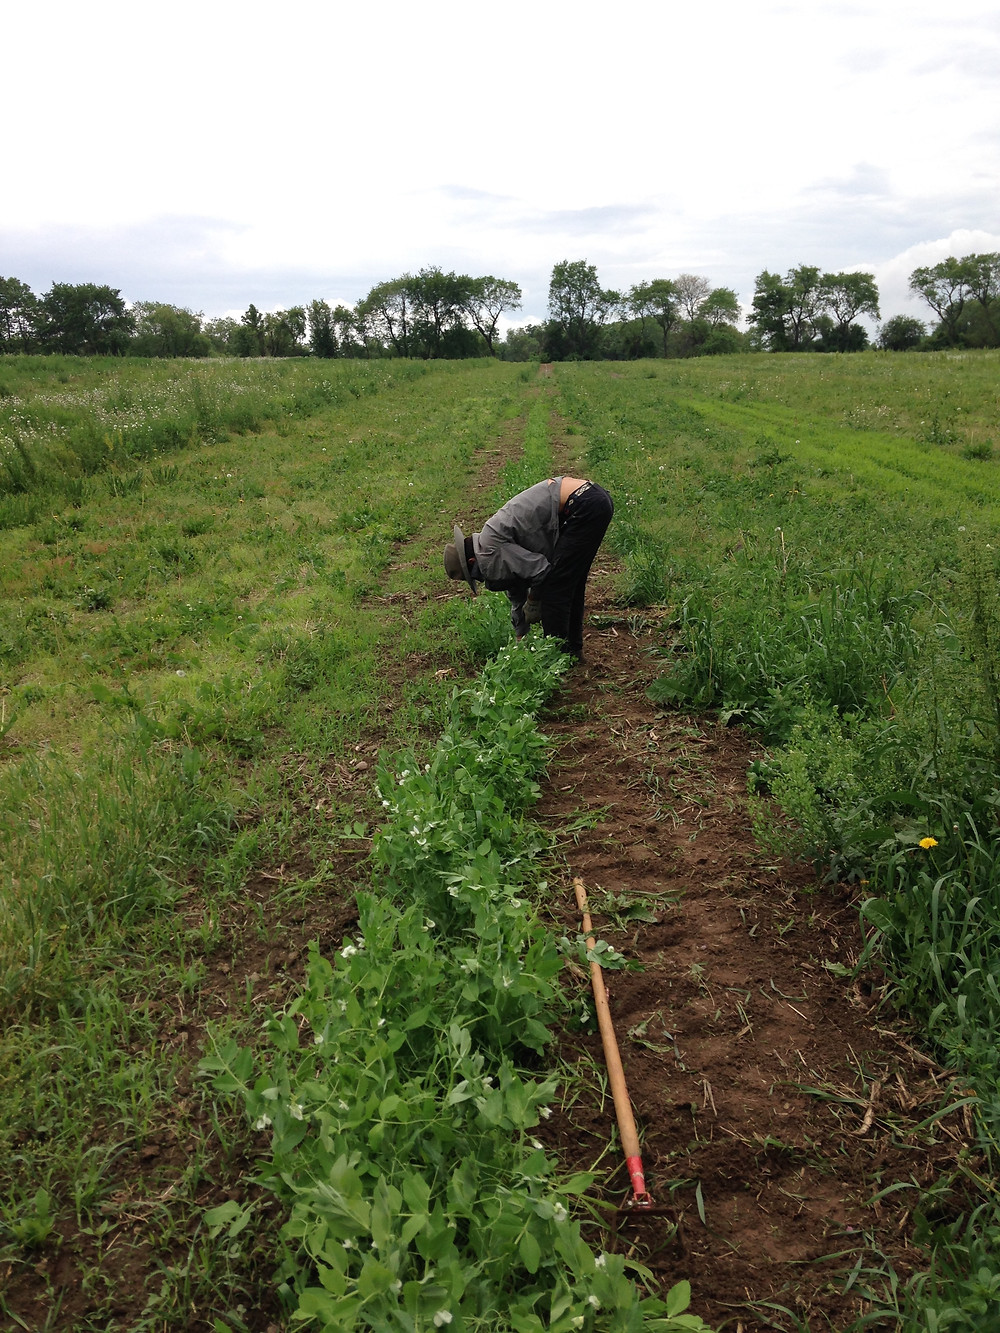 Raul weeding peas